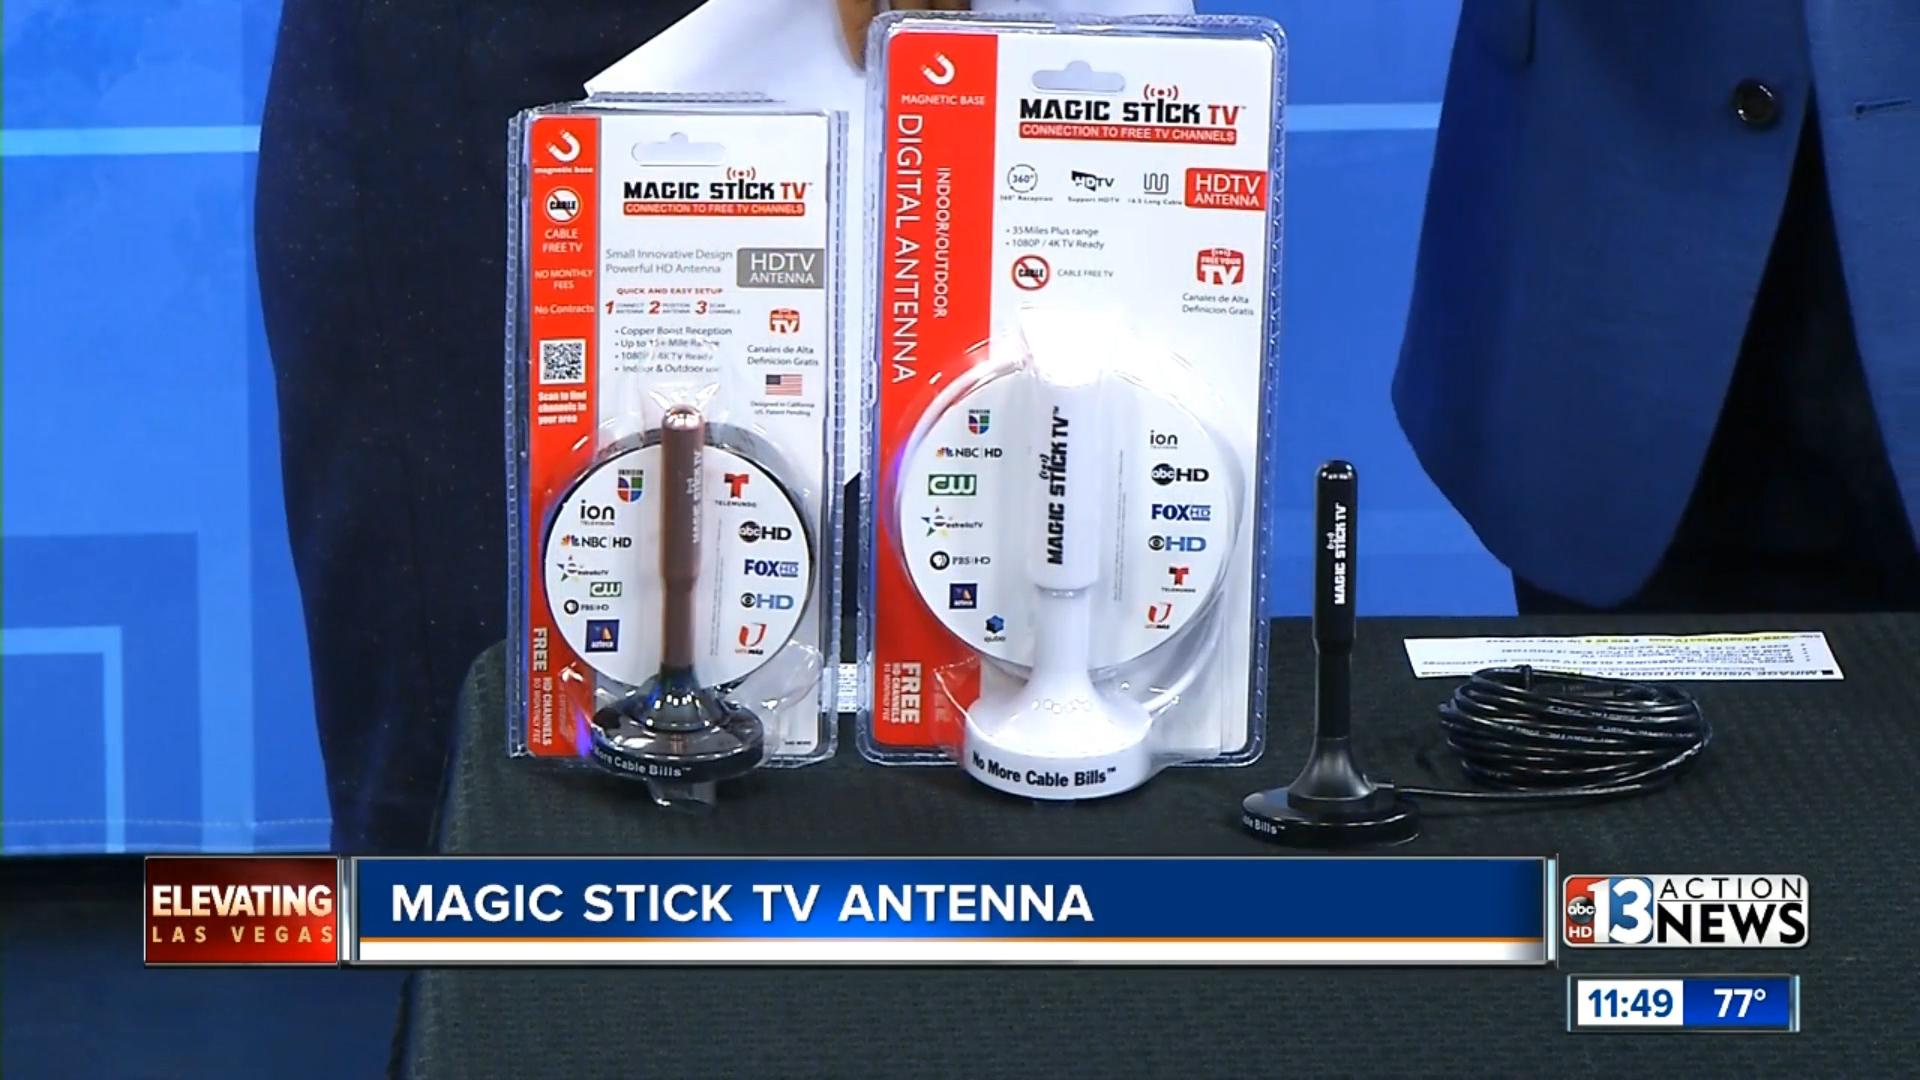 MAGIC STICK TV ANTENNA - Starting at $19.95Shop Now